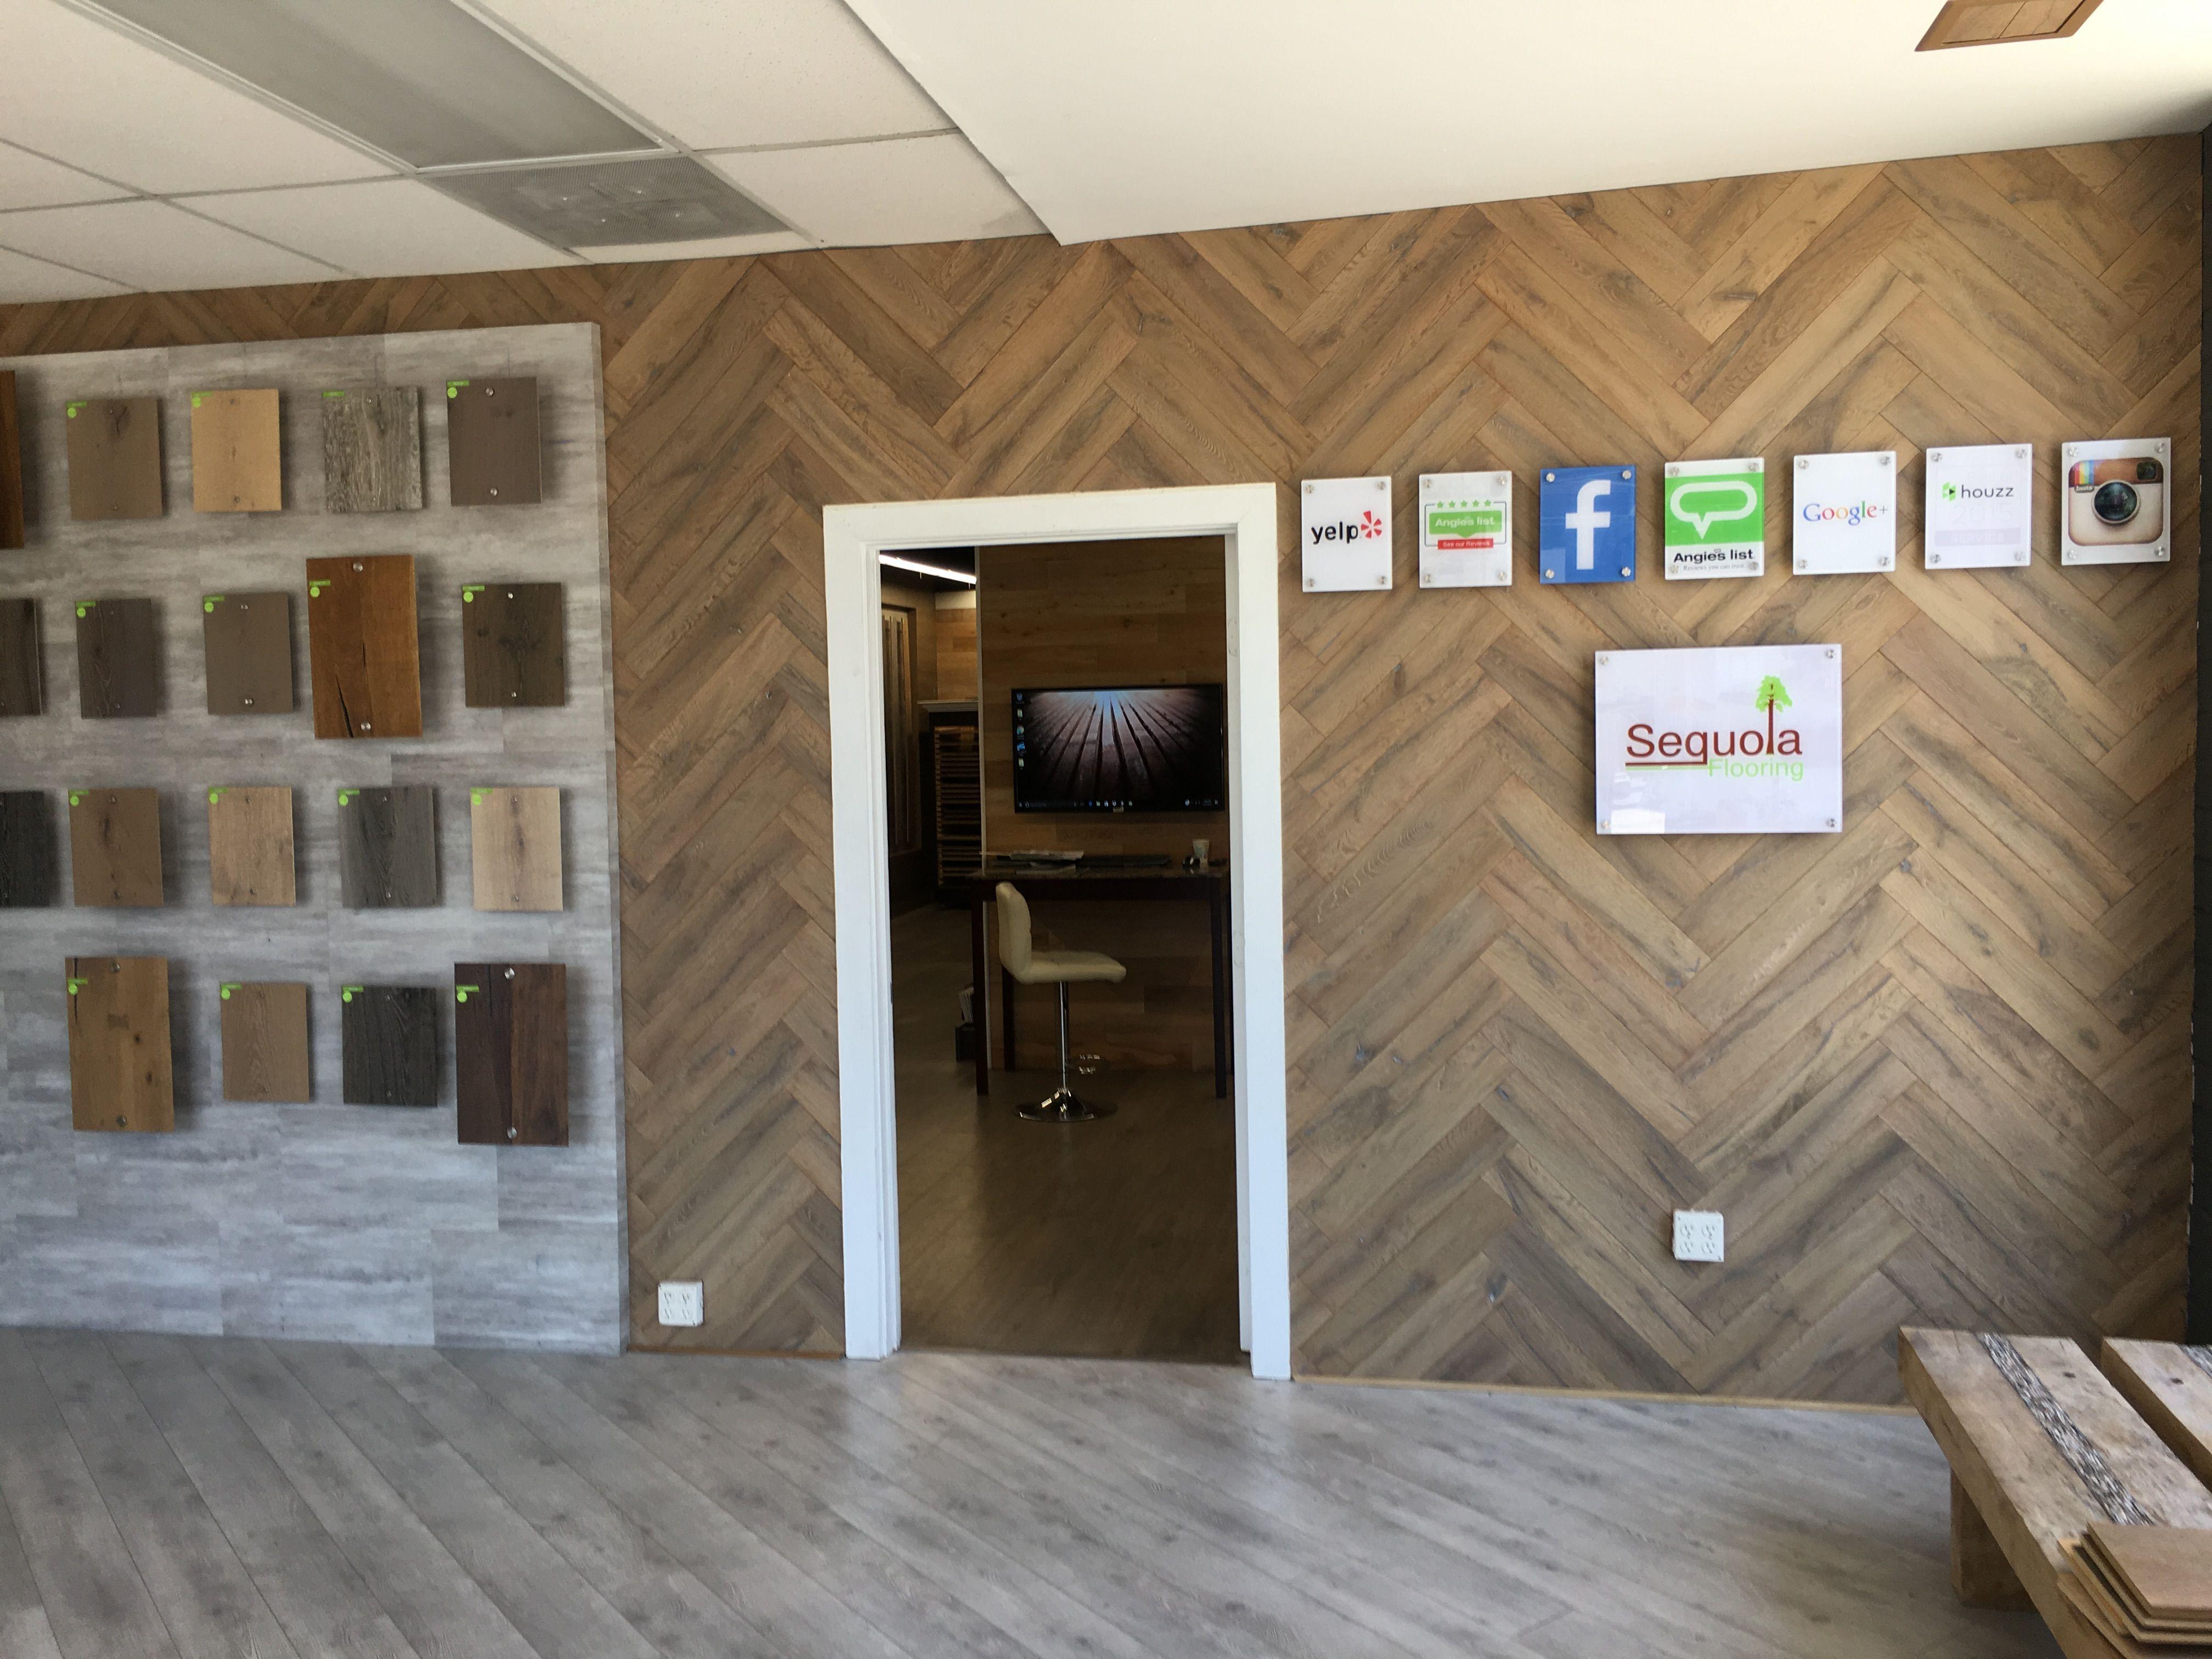 Pin by Sequoia flooring on Showrooms Flooring contractor